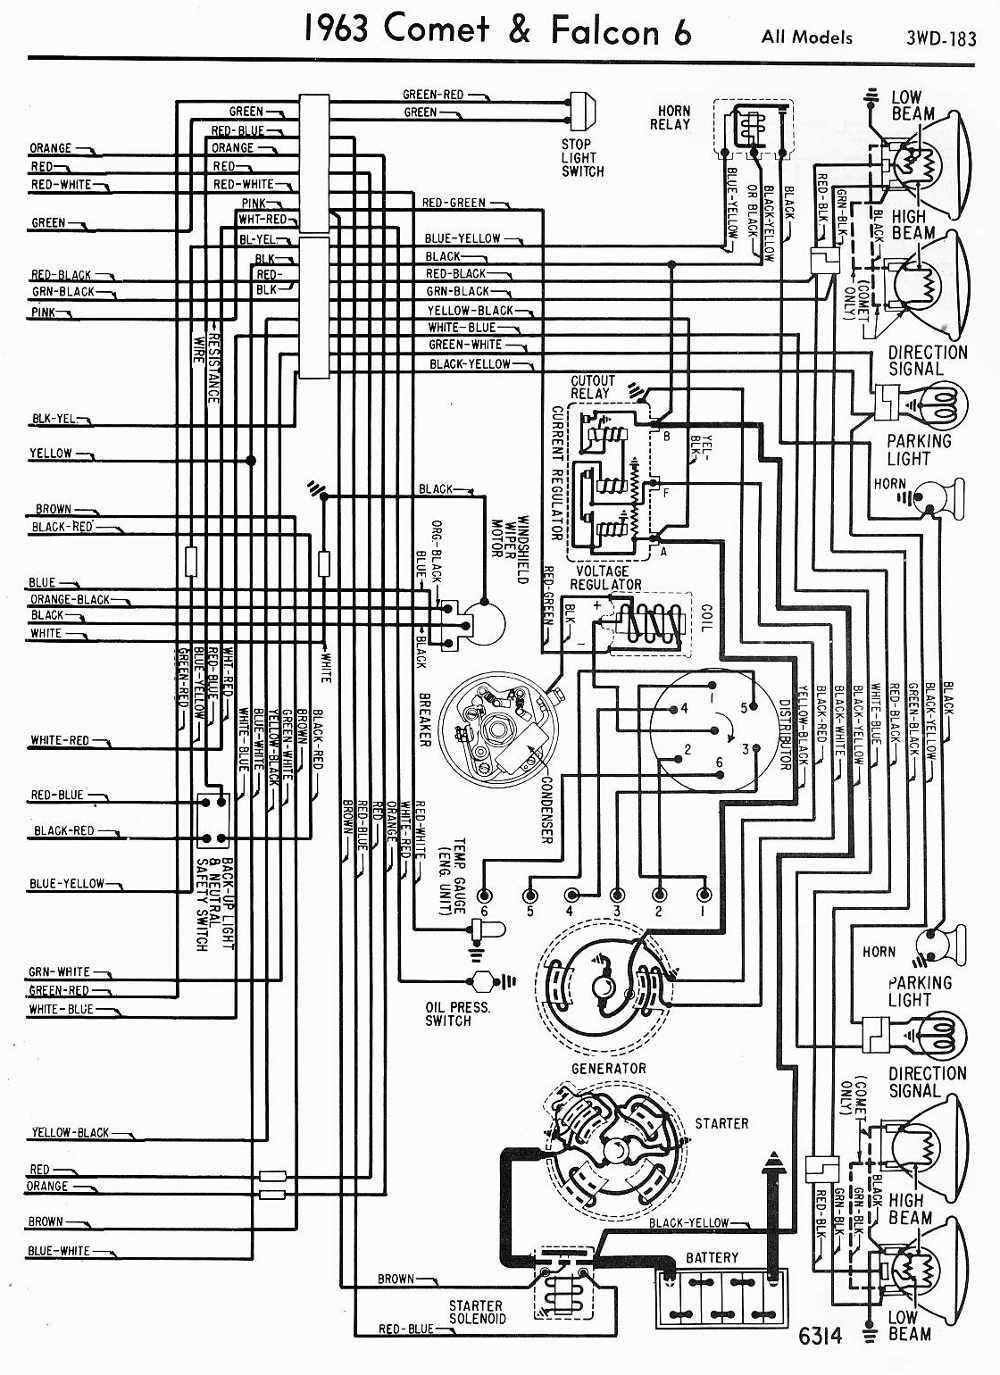 Diagram Ford Falcon Fg Wiring Diagram Full Version Hd Quality Wiring Diagram Diagramplumbersl Barbieri23 It